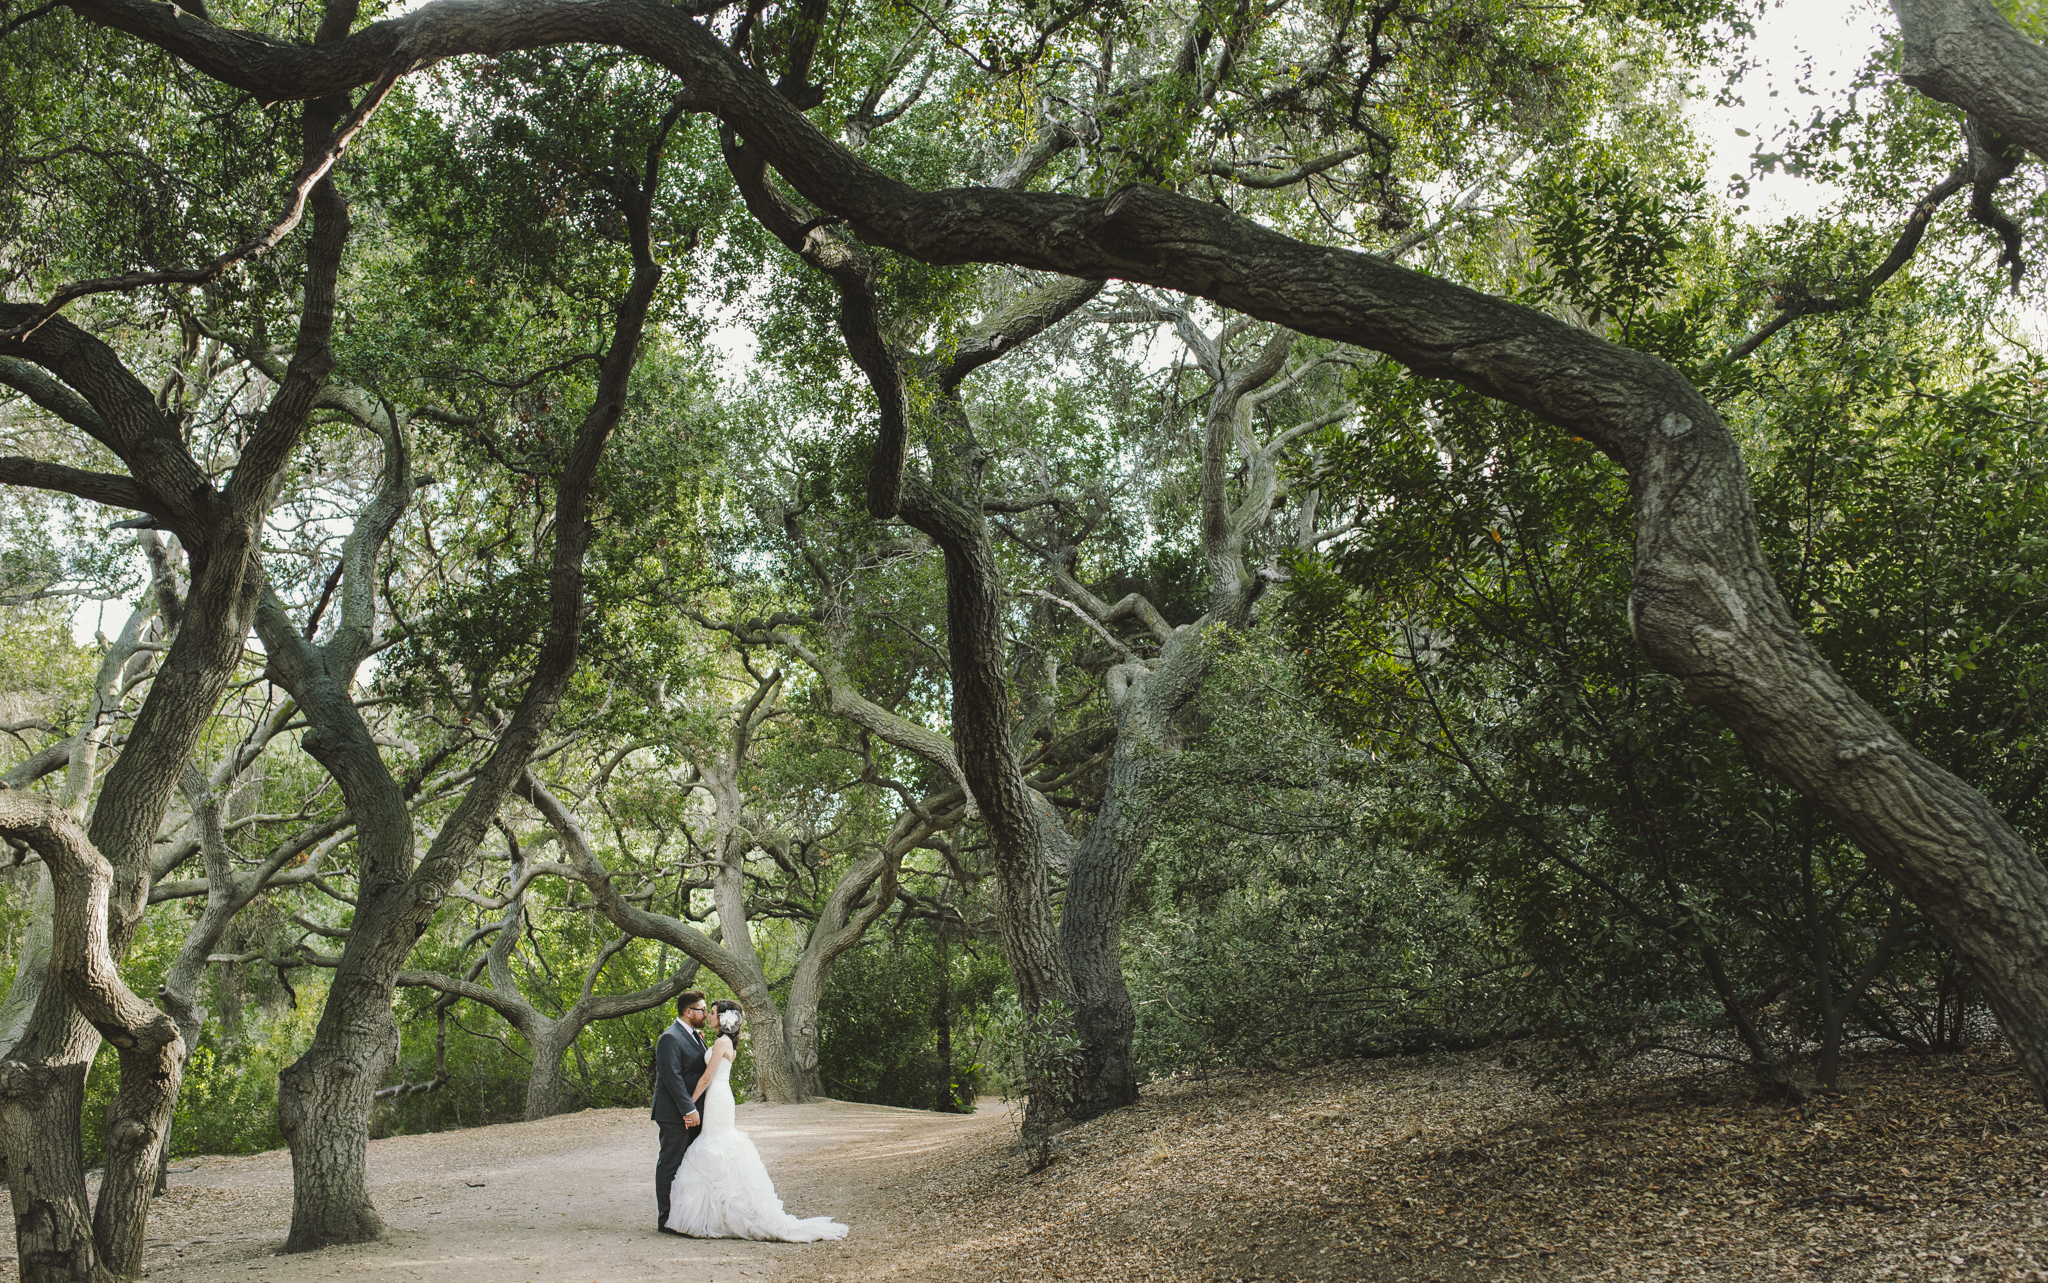 Isaiah & Taylor Photography - Los Angeles Lifestyle Wedding Photographer-22.jpg